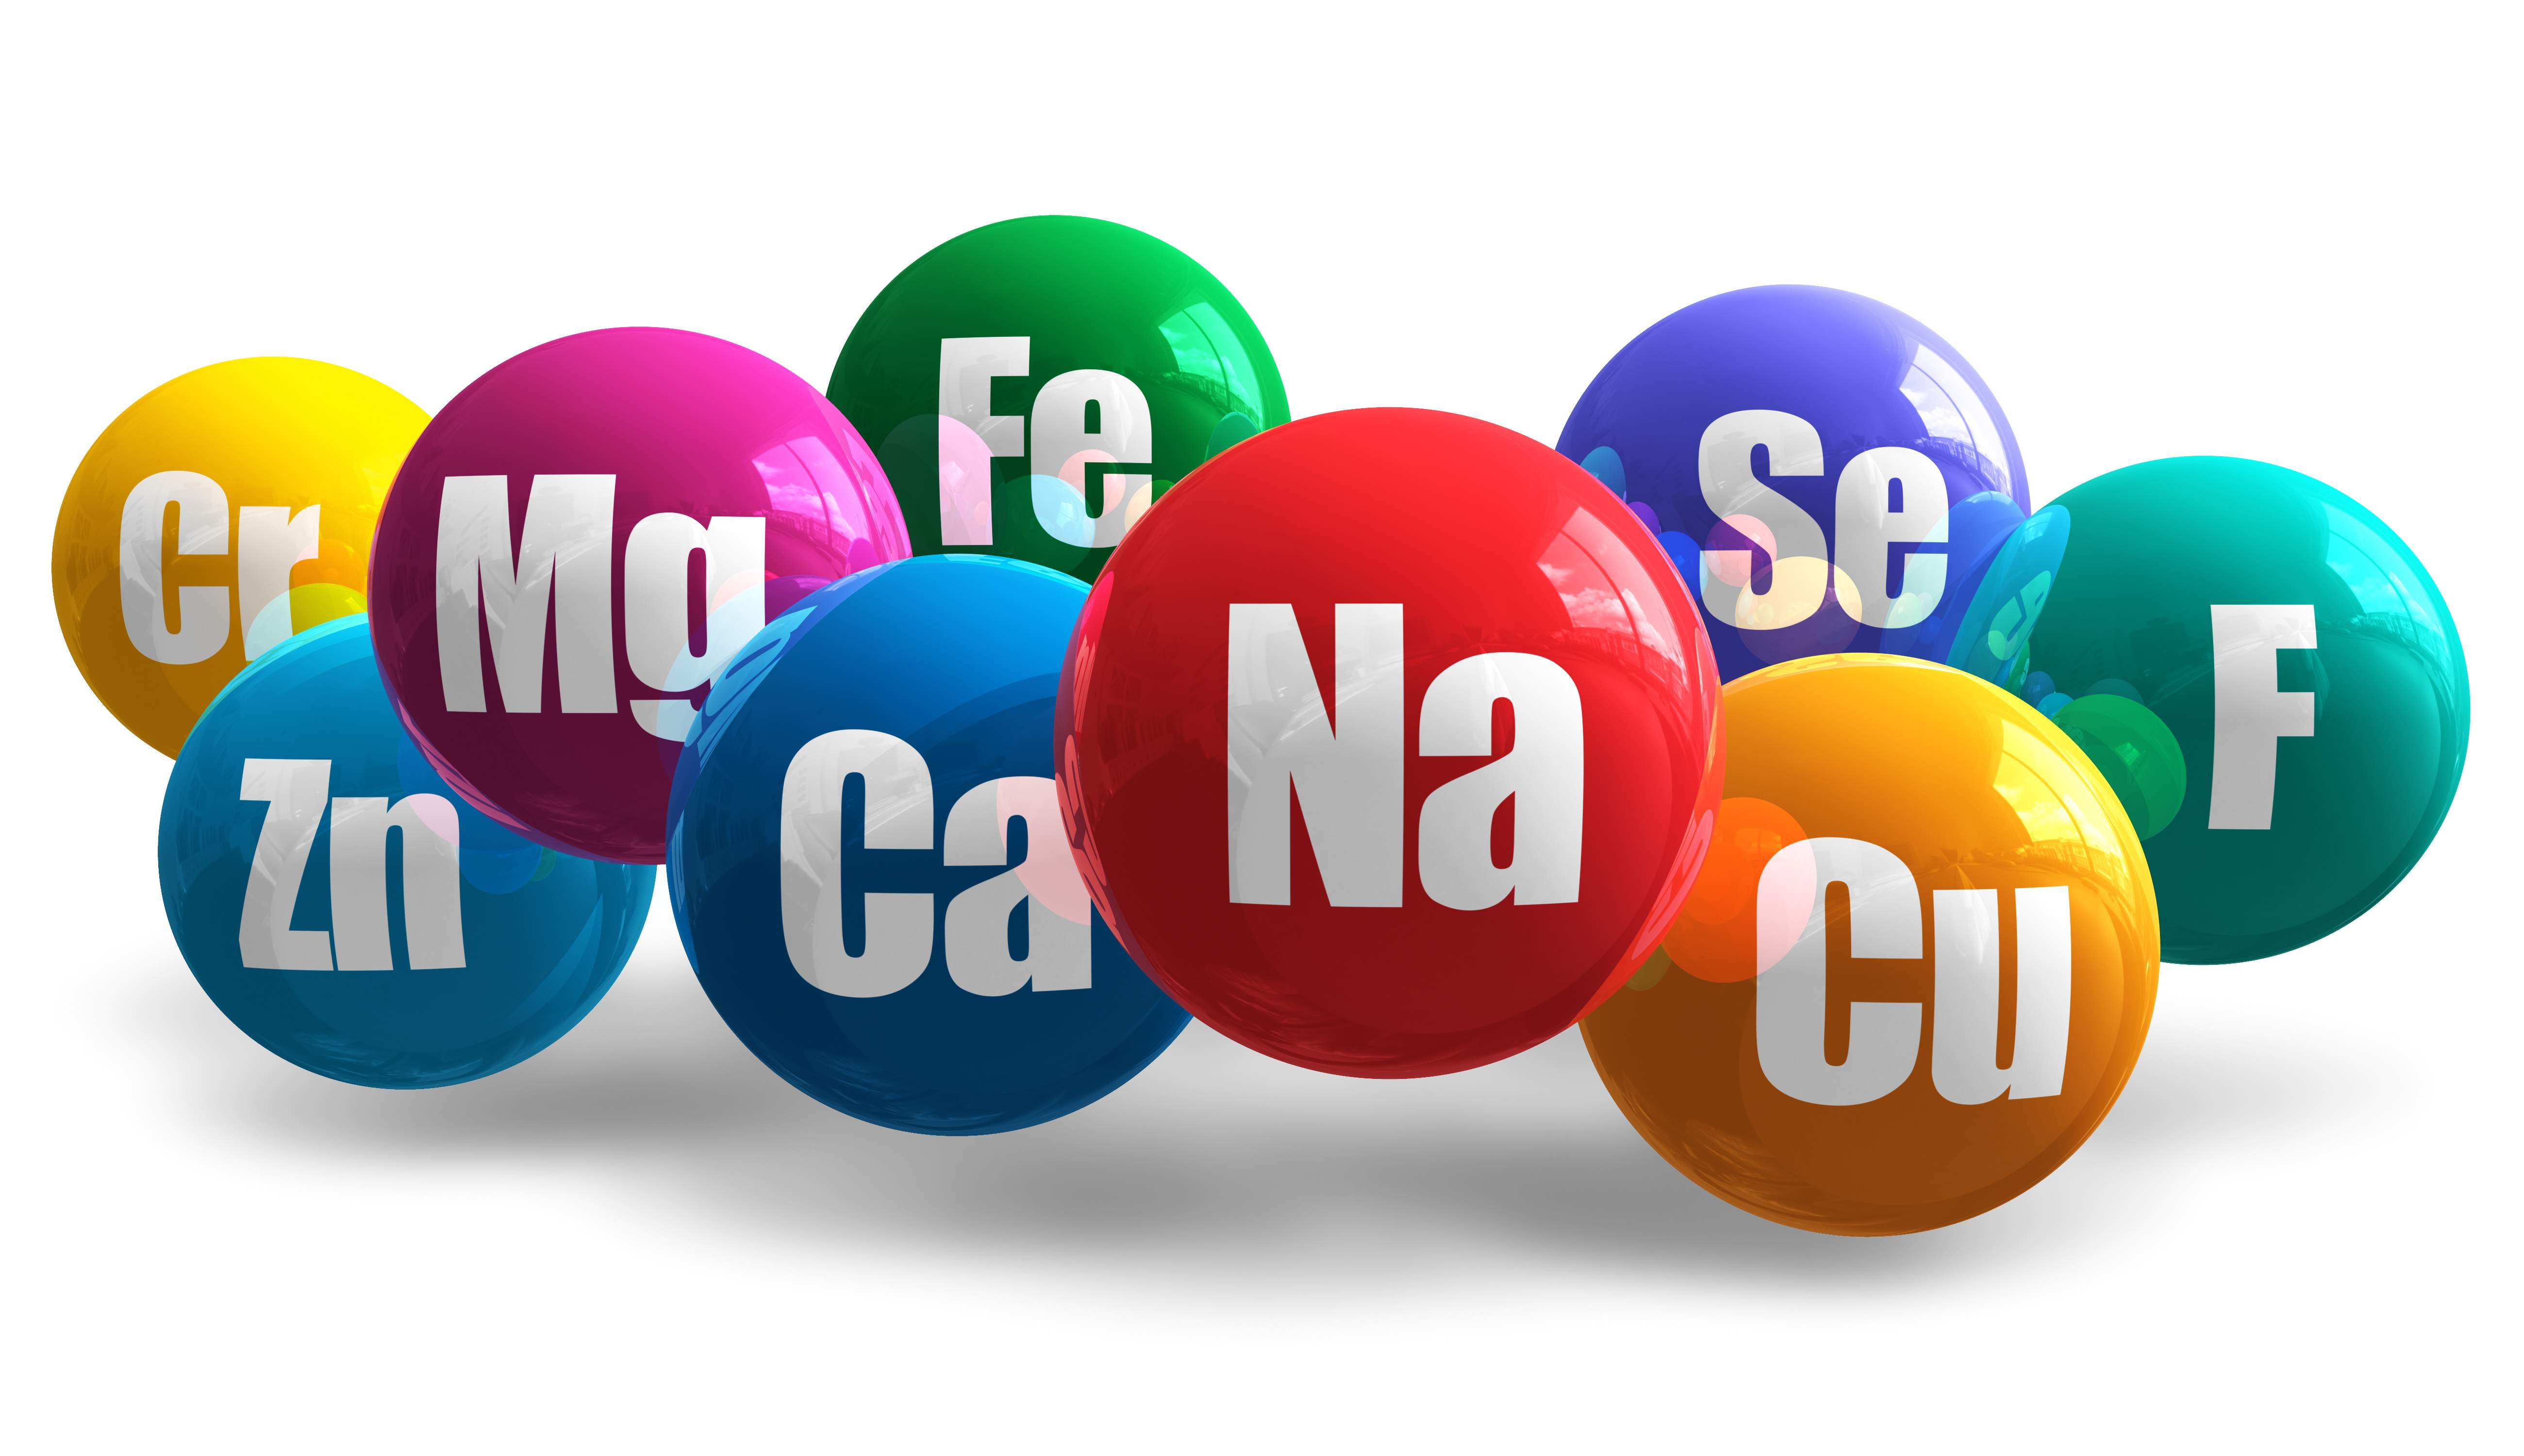 Elements #5